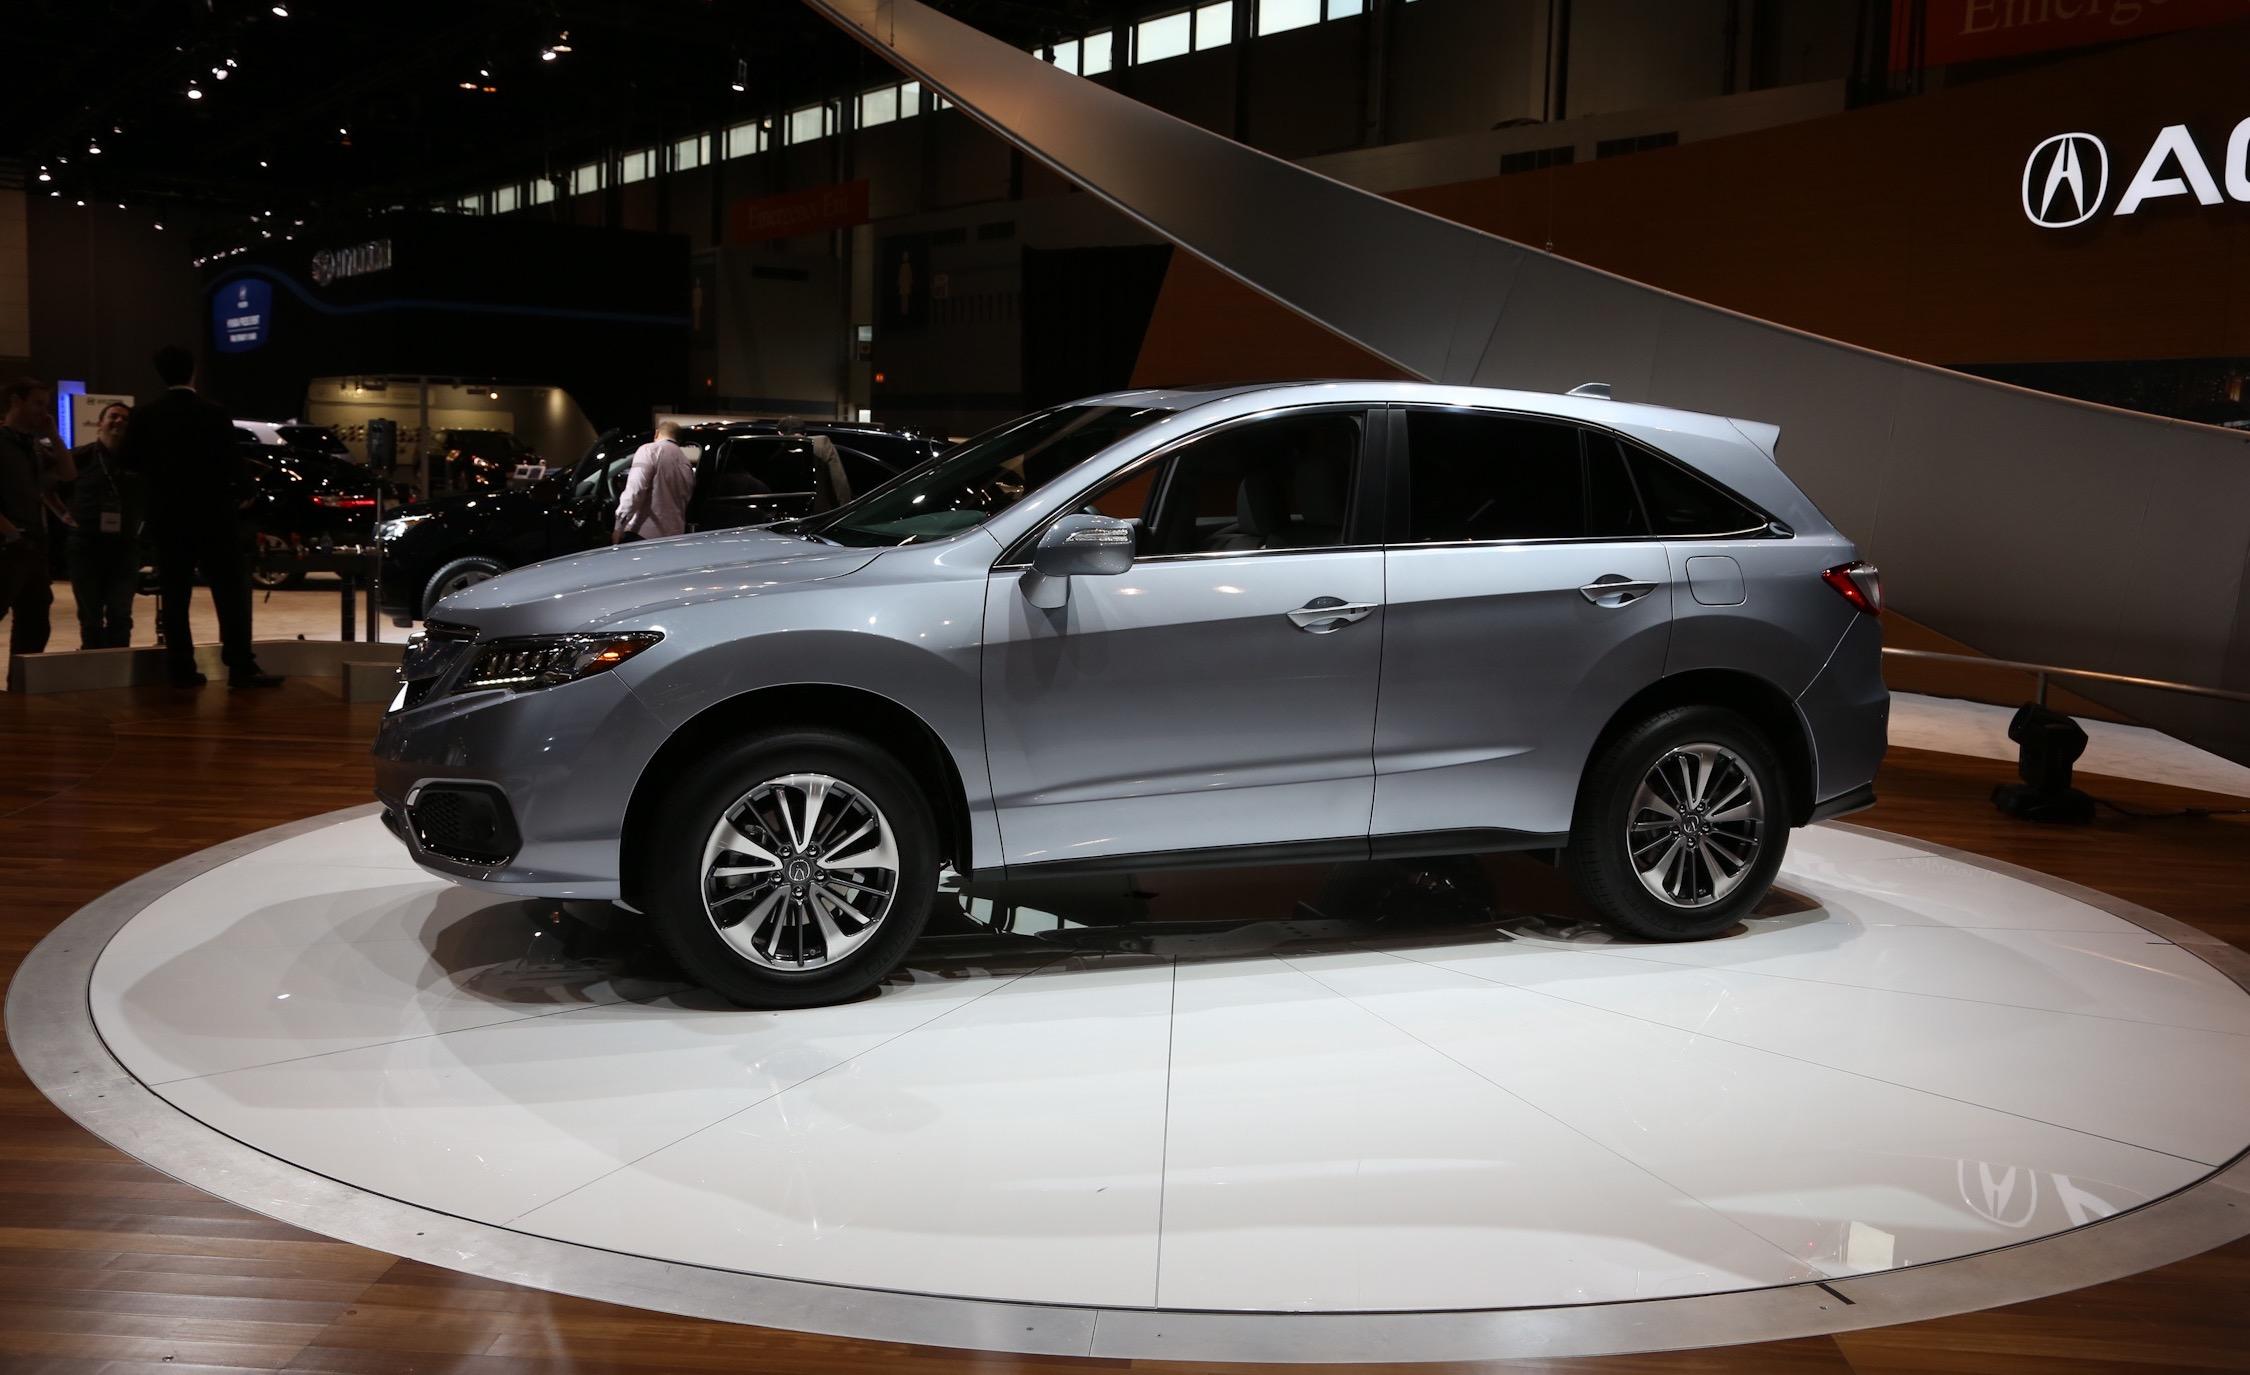 2015 Chicago Auto Show - Acura RDX 2016